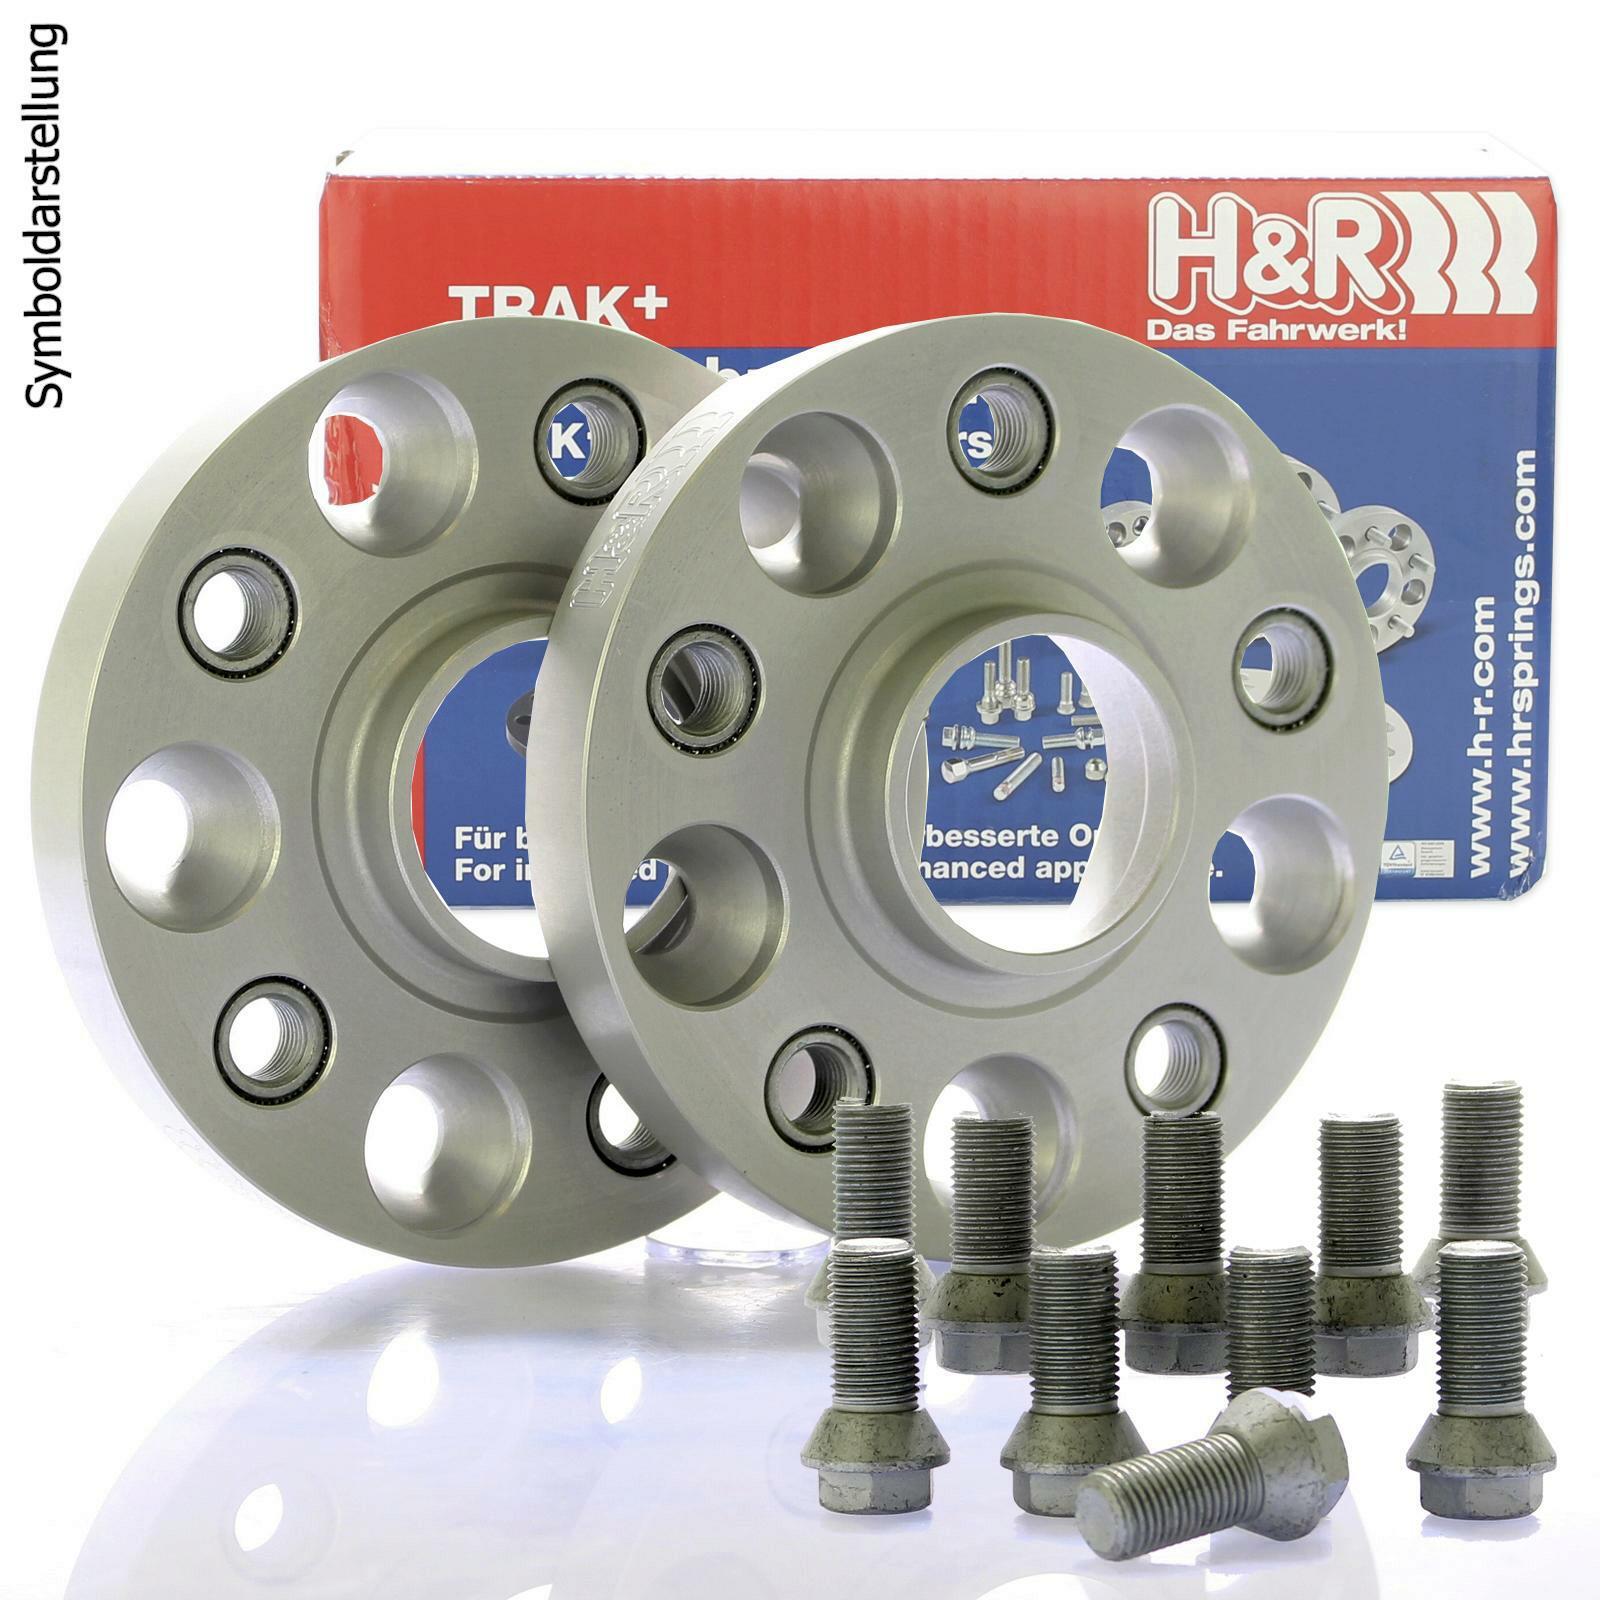 H&R DRa Spurplatten Spurverbreiterung Distanzscheibe 5x120 60mm // 2x30mm